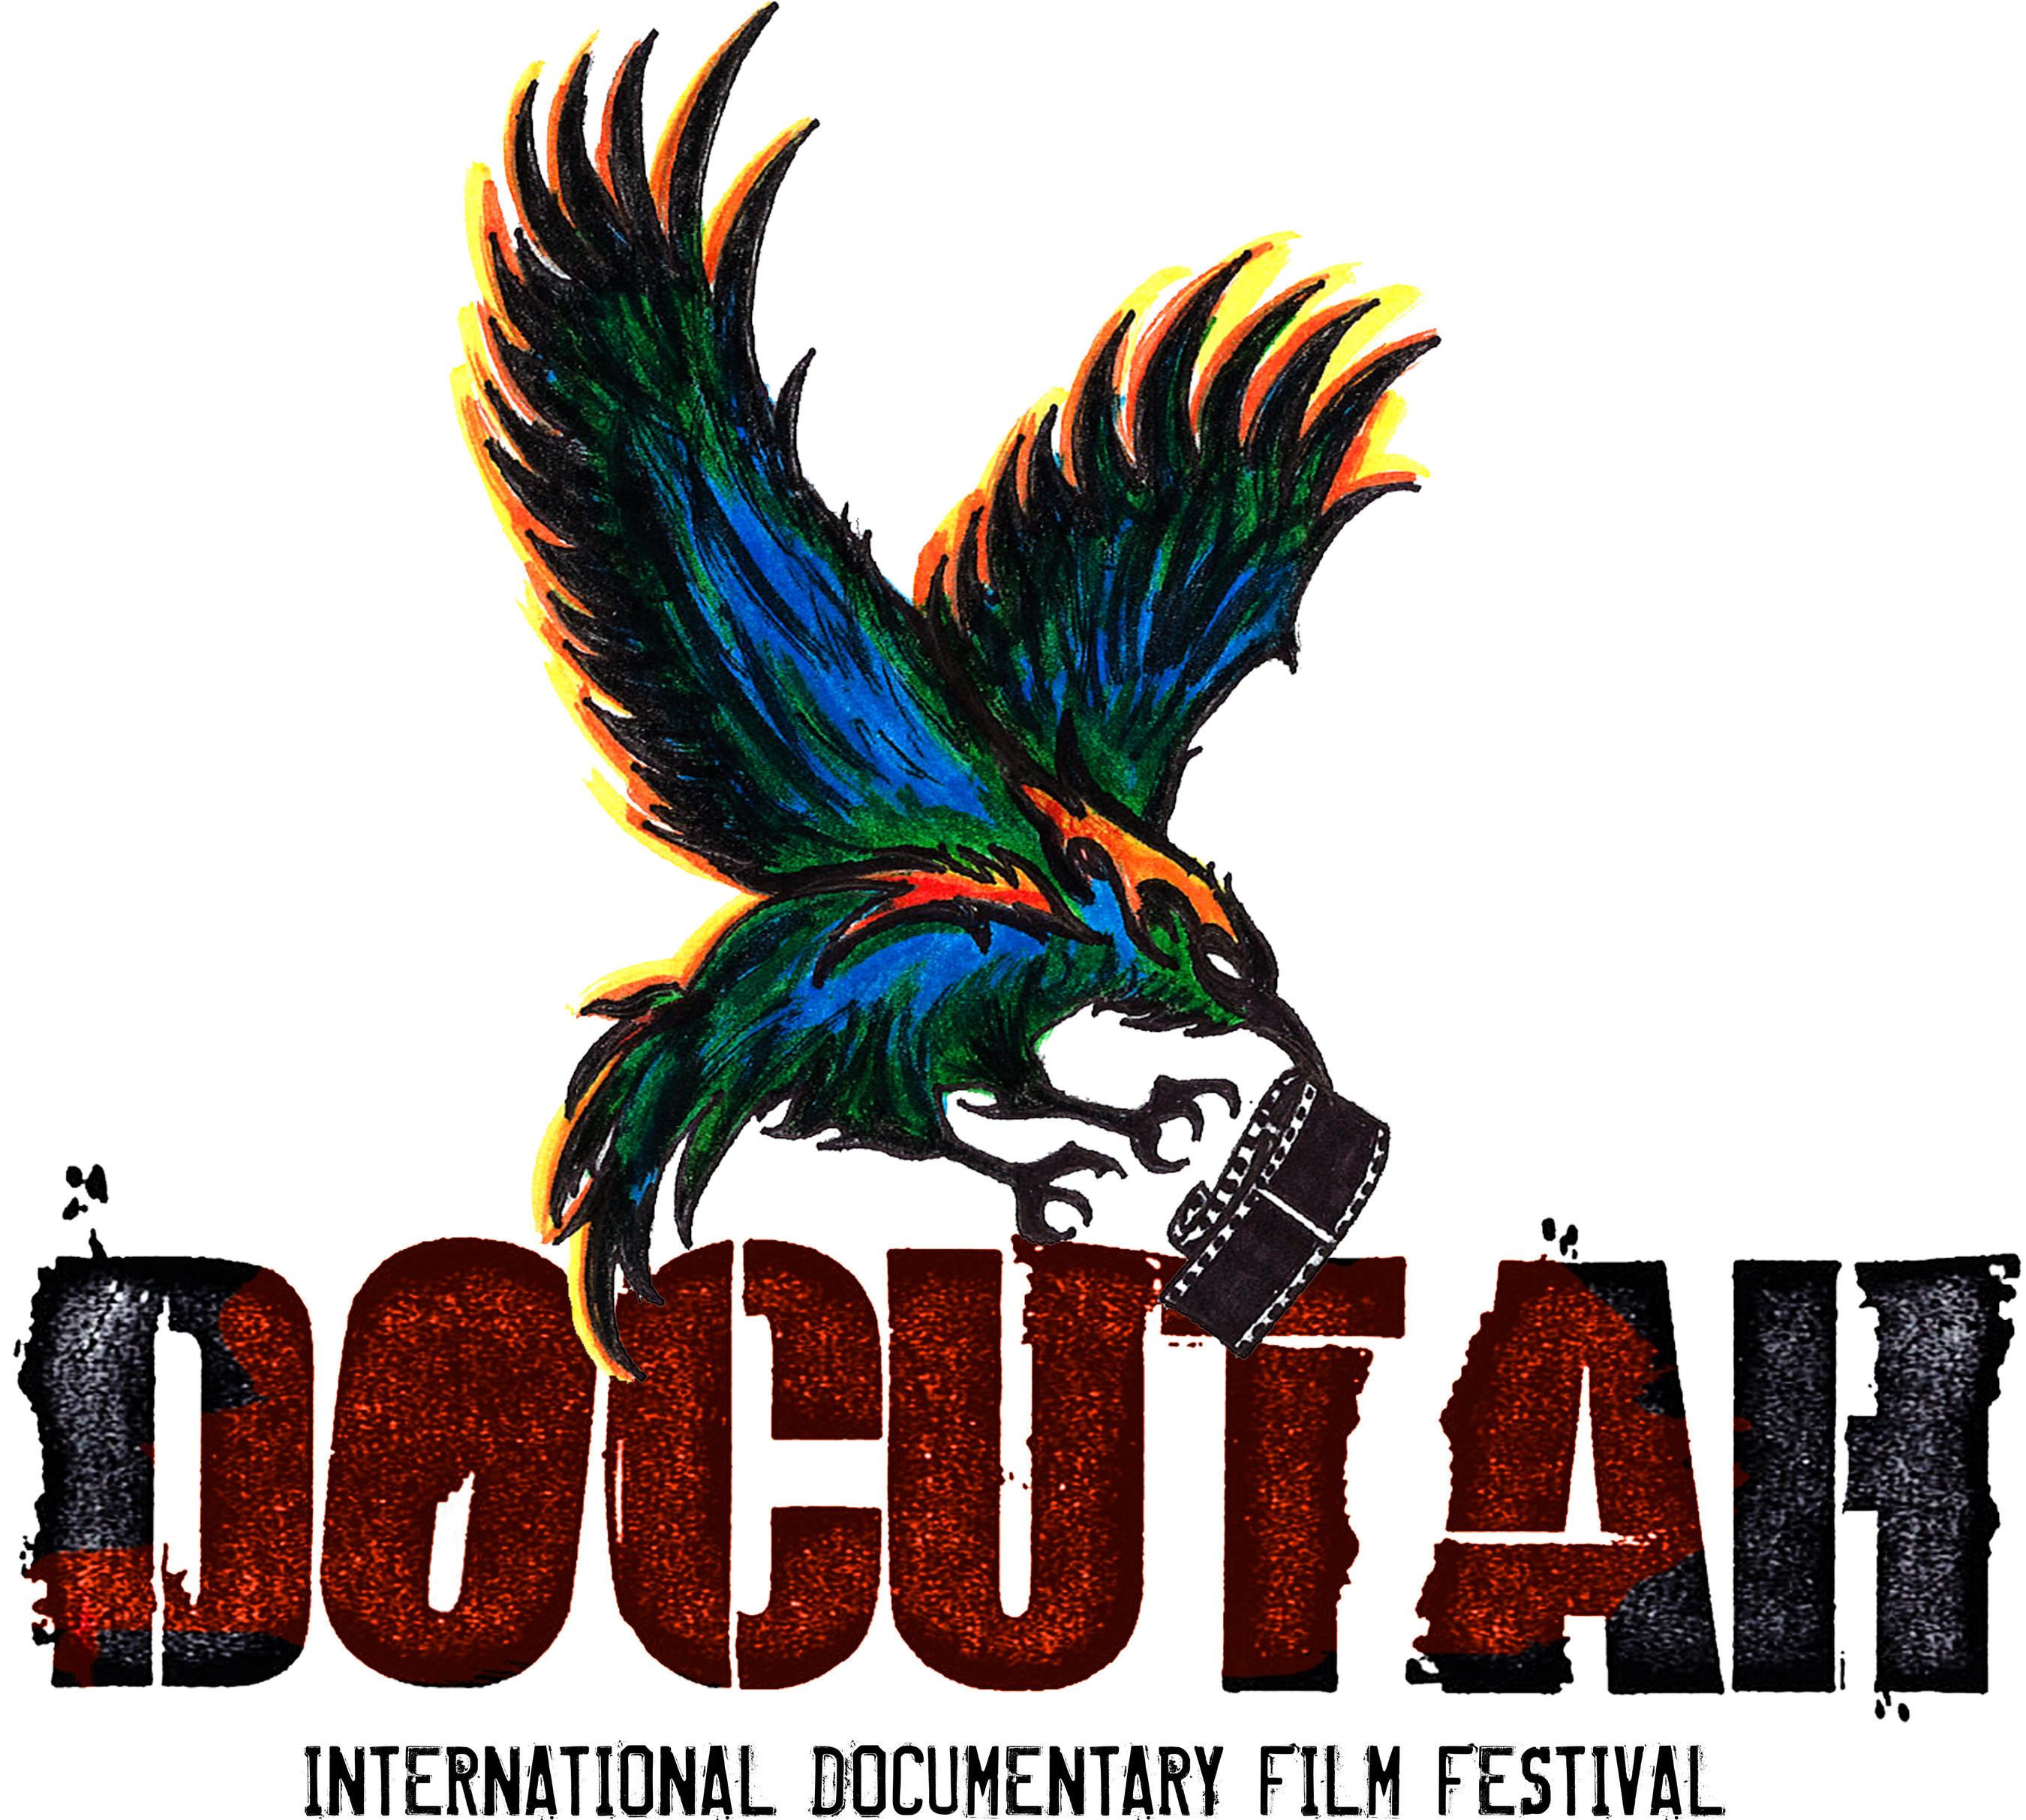 DOCUTAH International Documentary Film Festival Announces 2016 Lineup